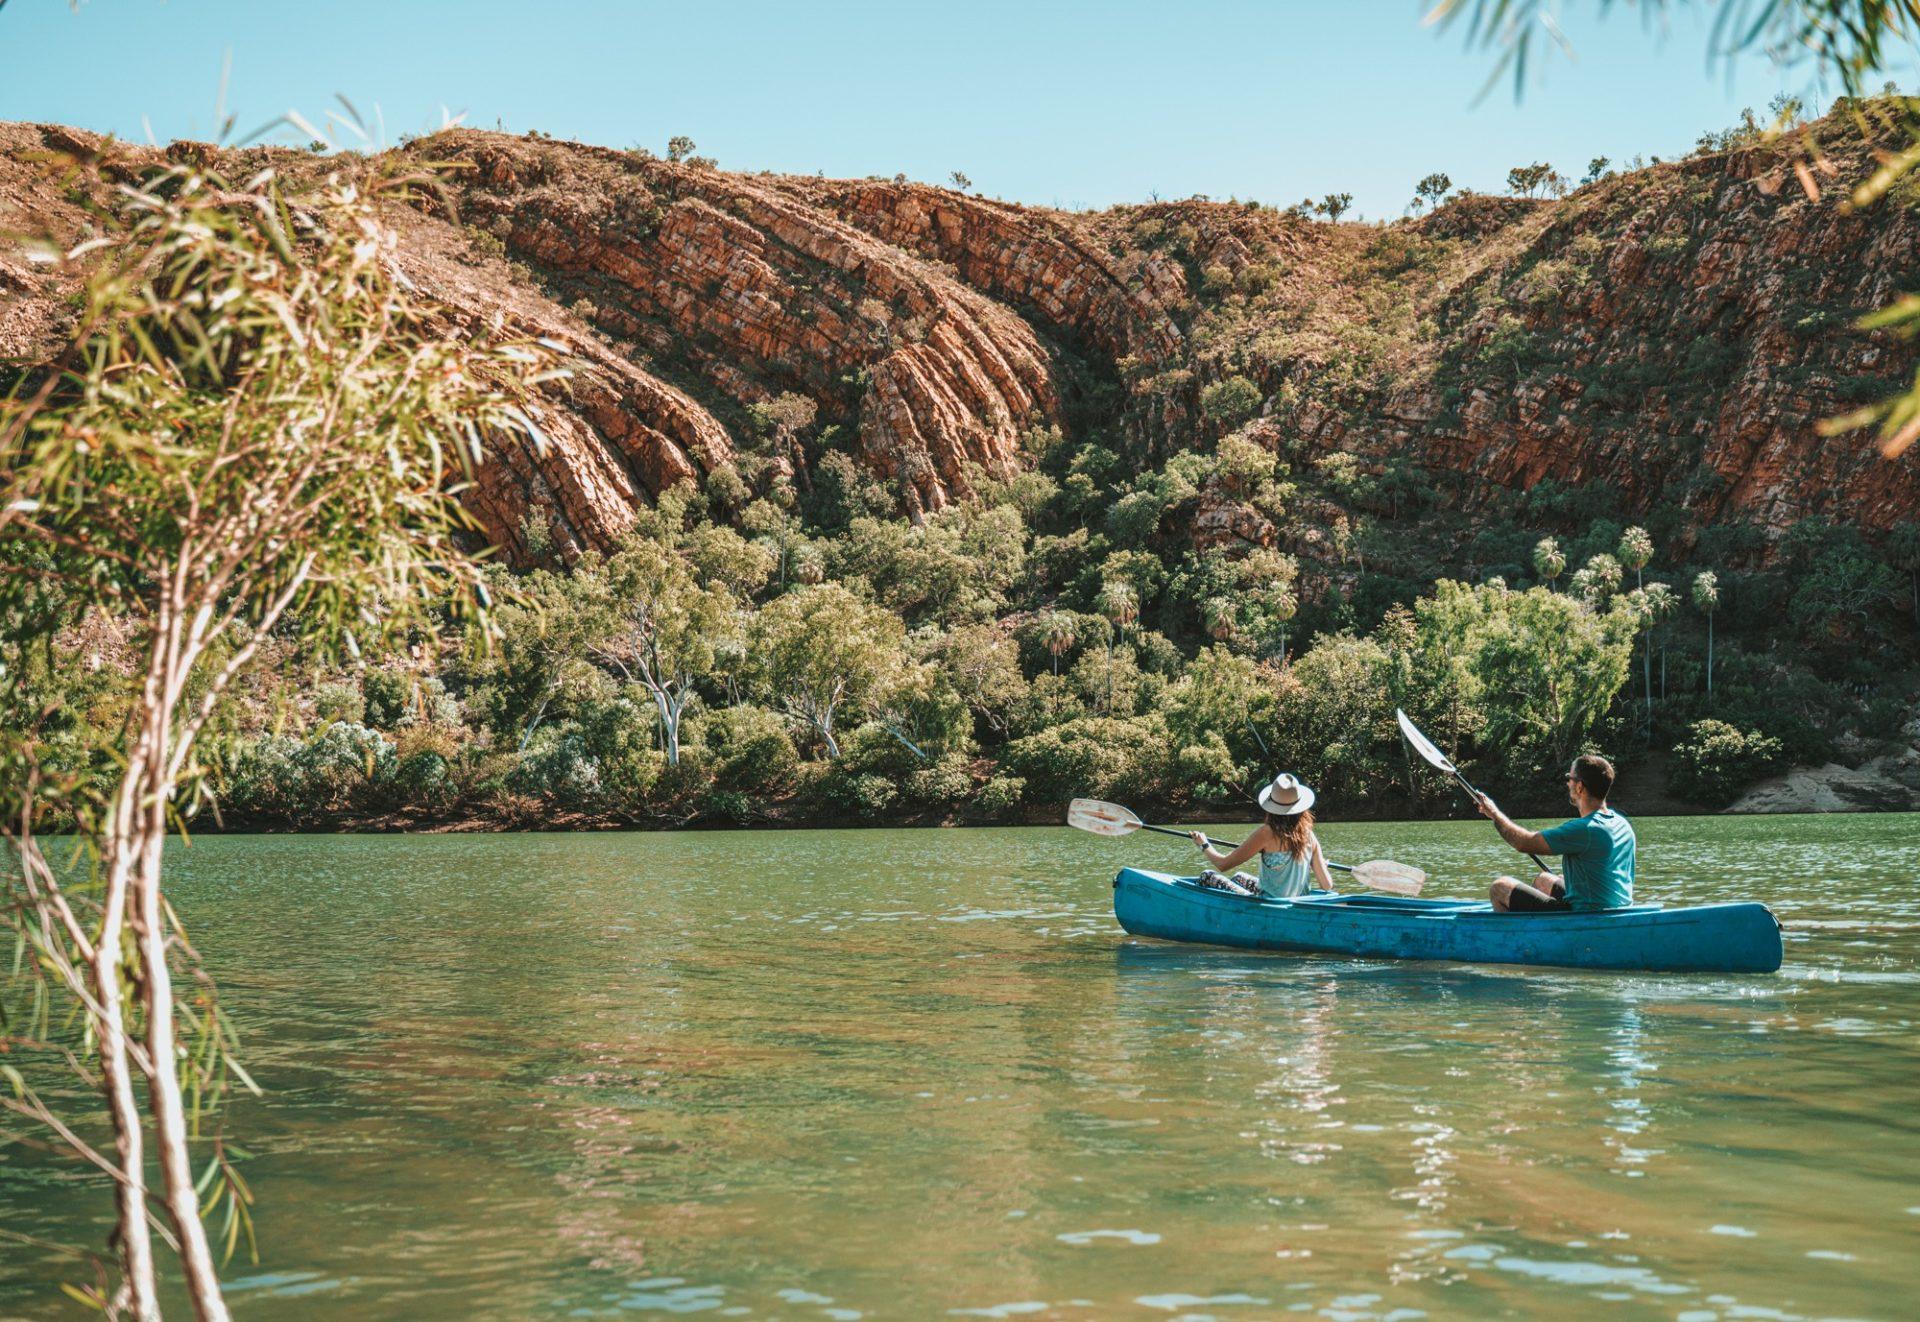 Kayaking at Dimond Gorge, Mornington Wilderness, Gibb River Road